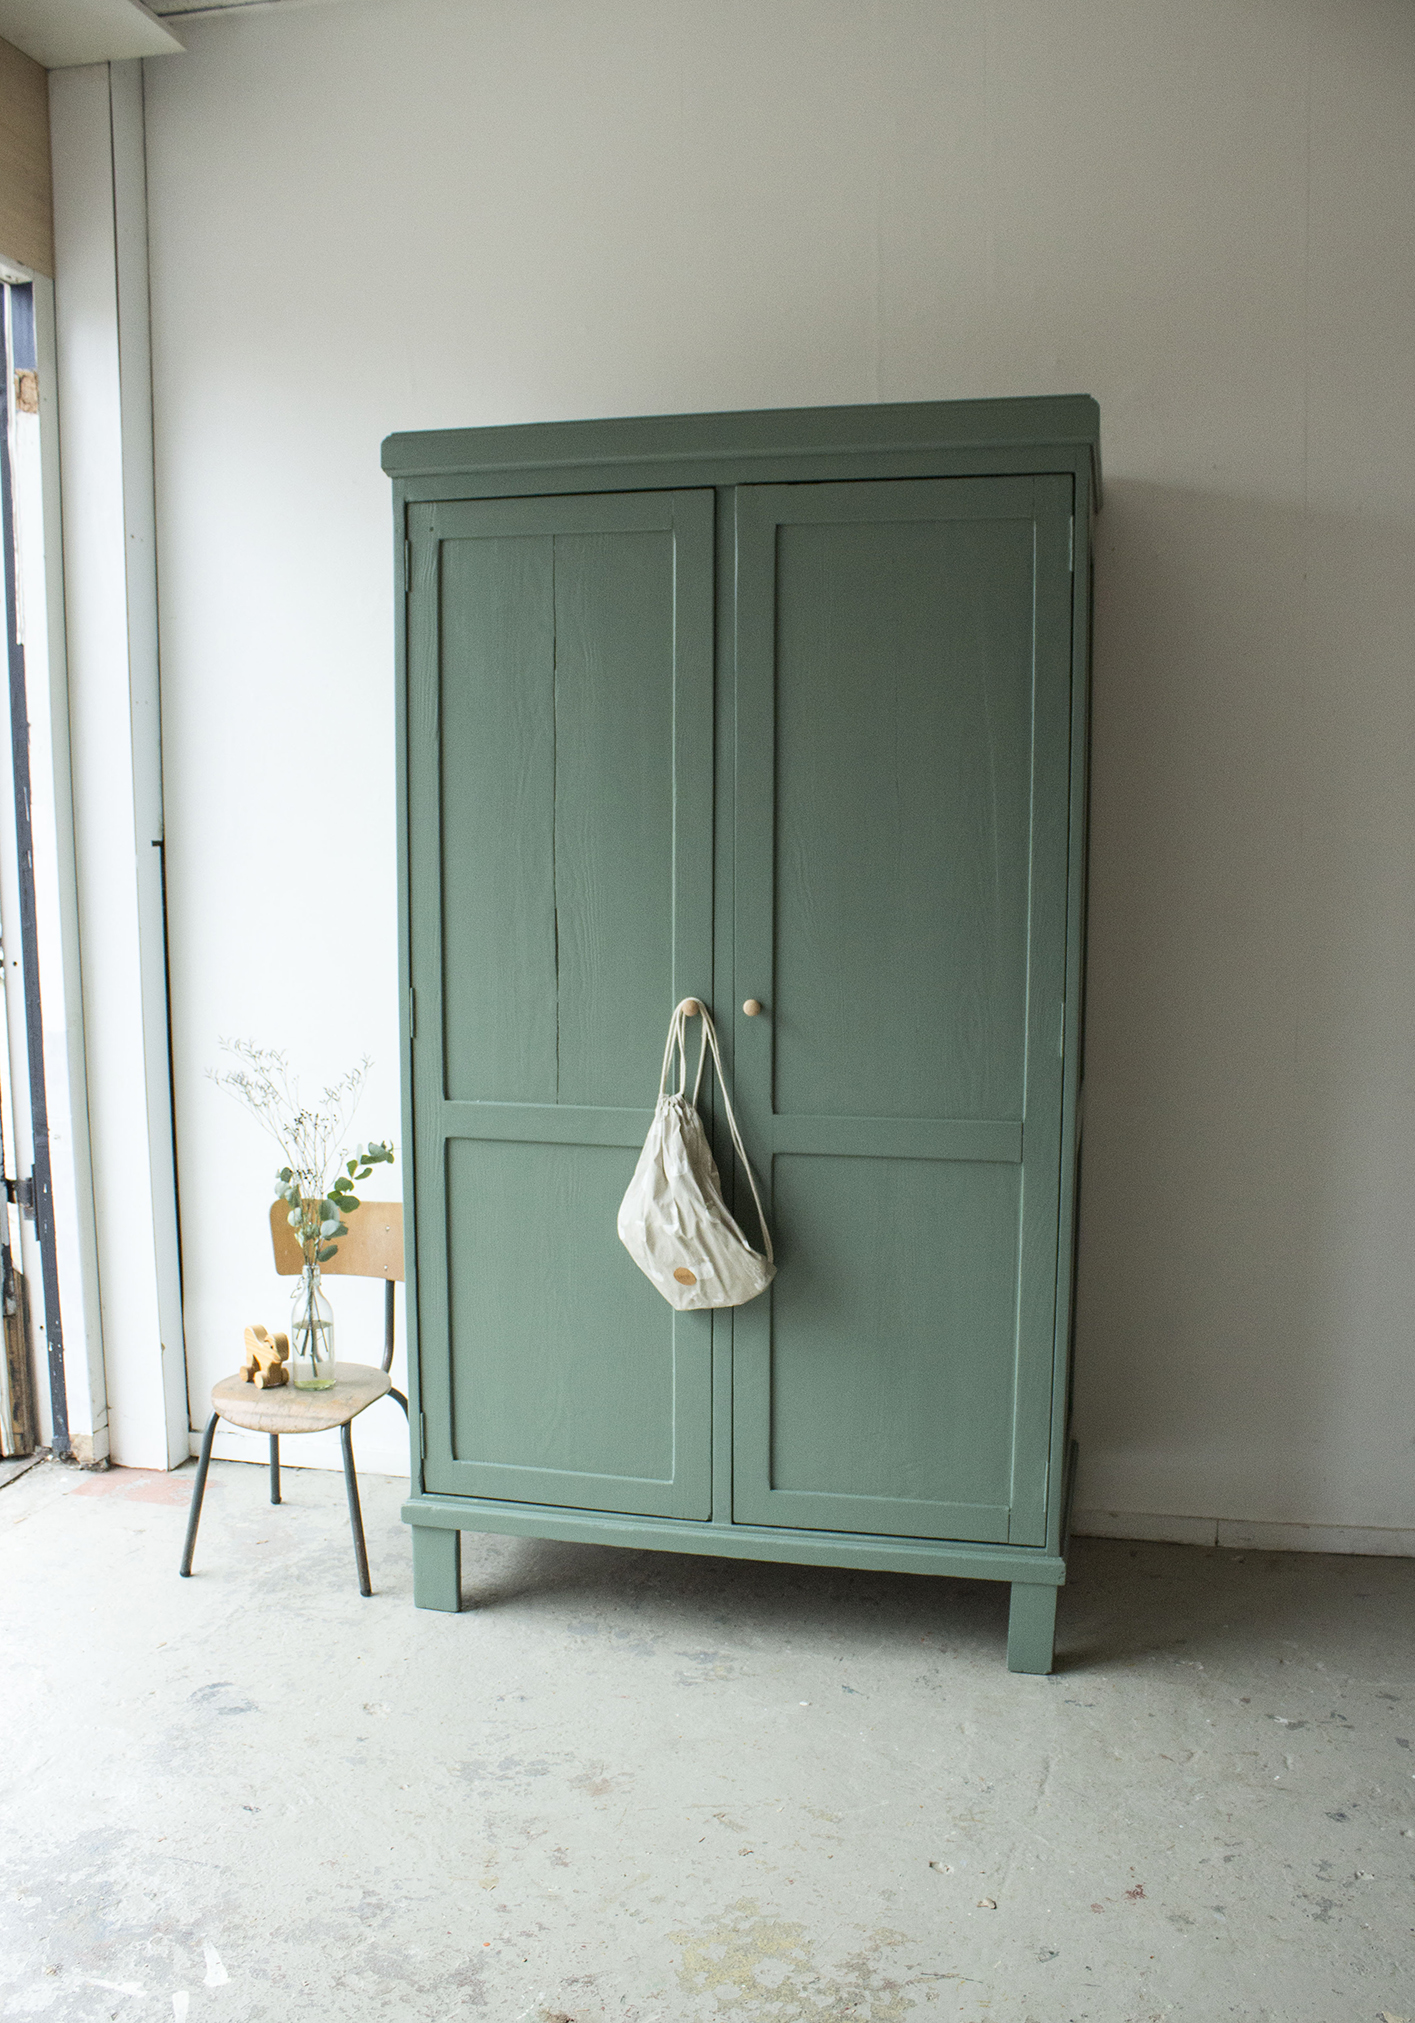 _Dennengroene vintage kledingkast -  Firma zoethout_1.jpg